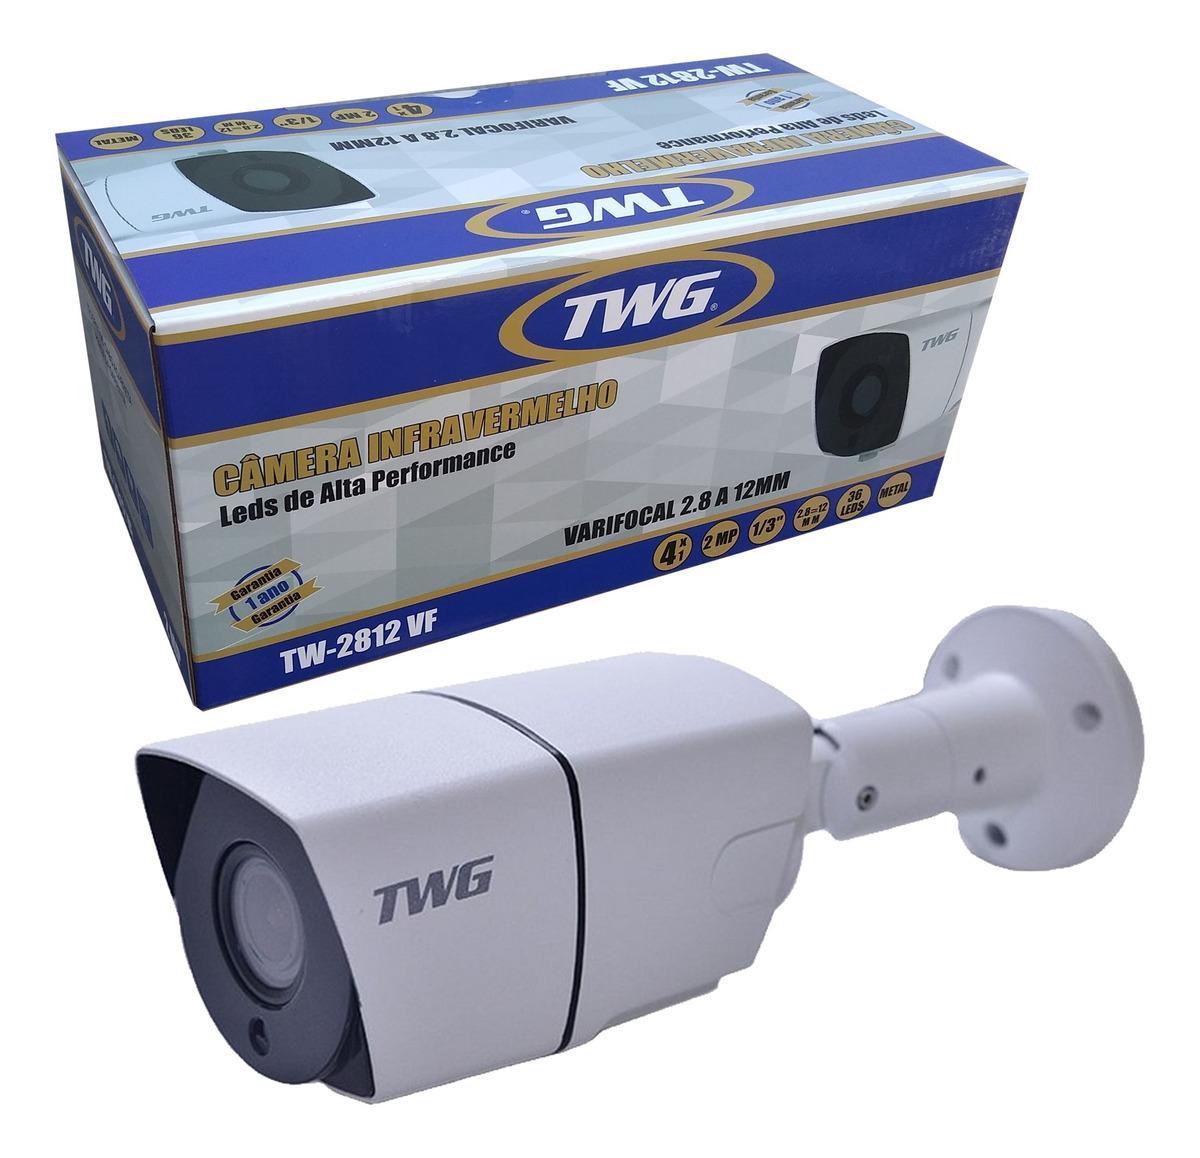 CÂMERA VARIFOCAL METAL 4X1 36 LEDS DE ALTA PERFORMANCE 2 MEGAPIXEL LENTE 2.8 A 12MM - TW-2812VF TWG.  - Tudoseg Cftv - Sistemas de Segurança Eletrônica